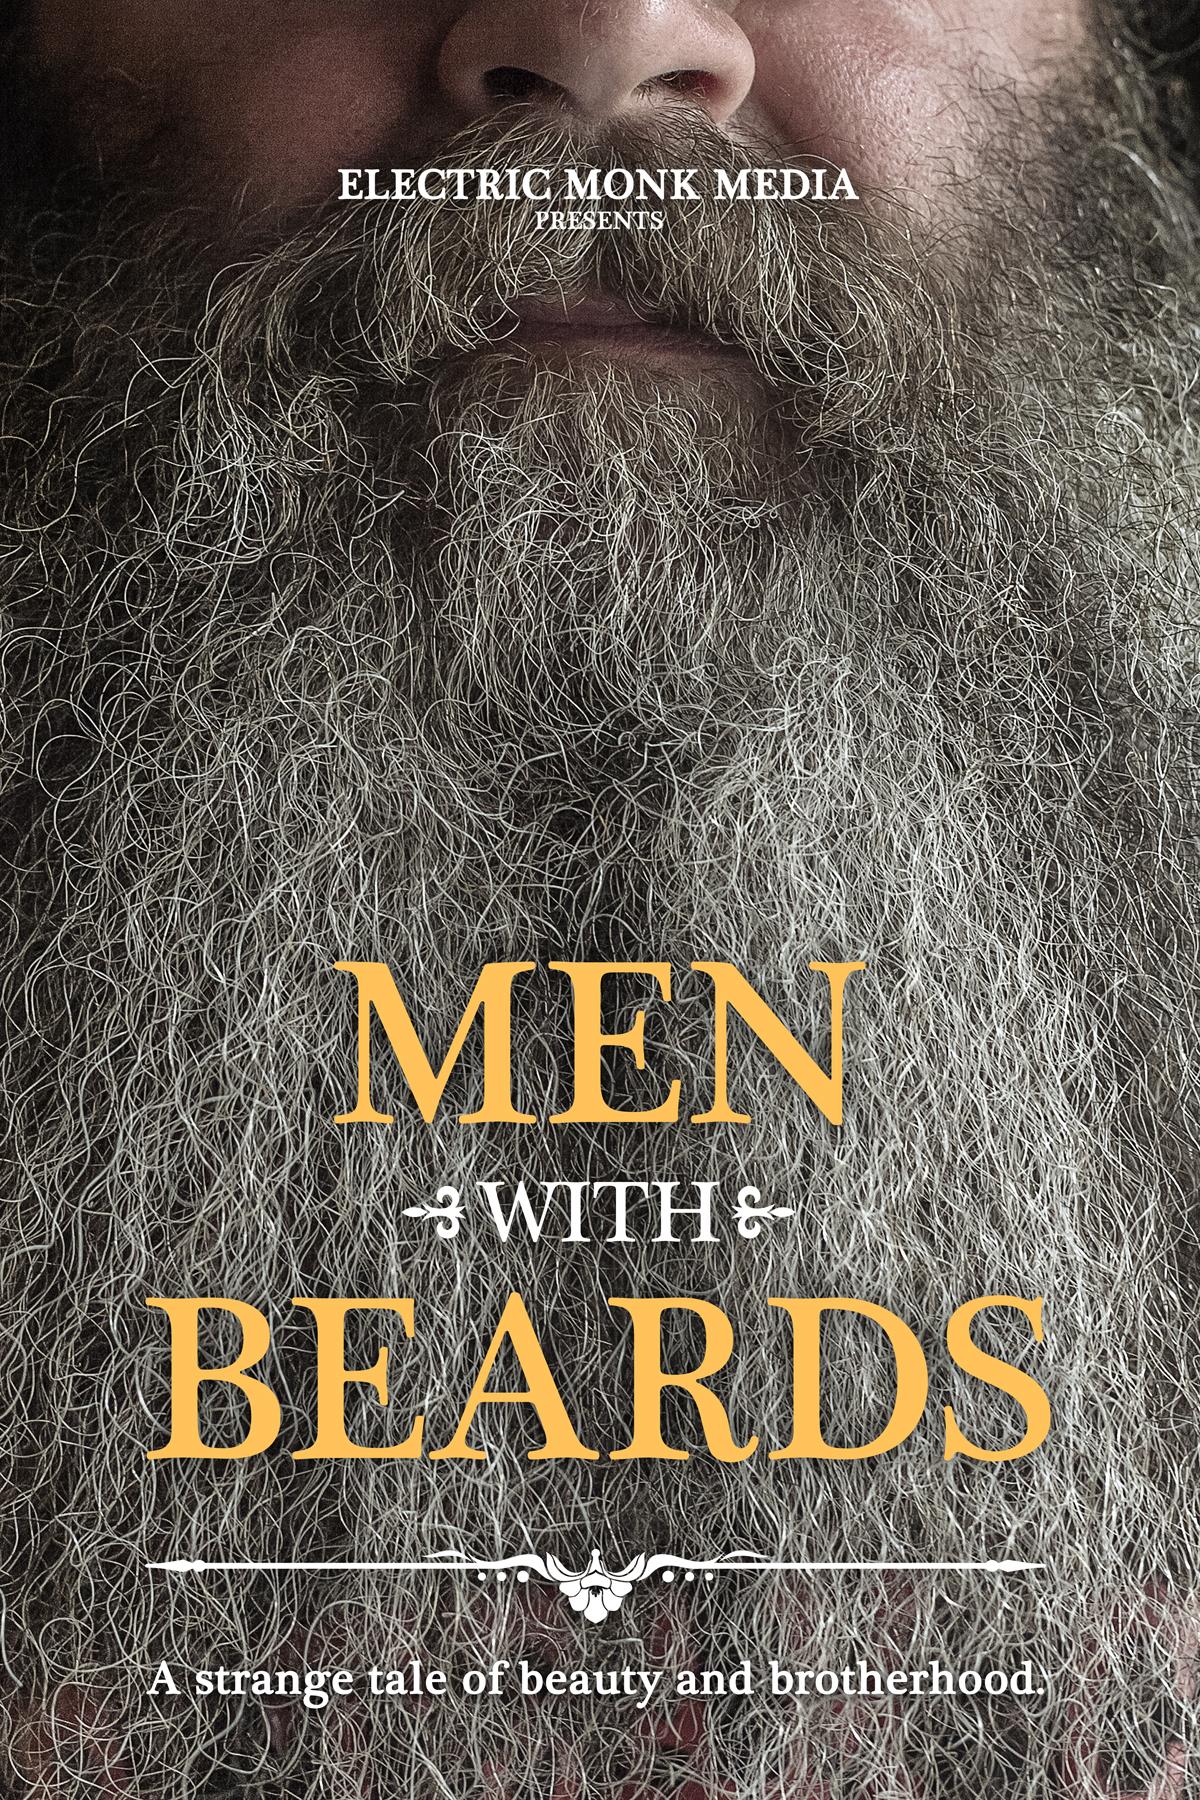 beardposter-press.jpg